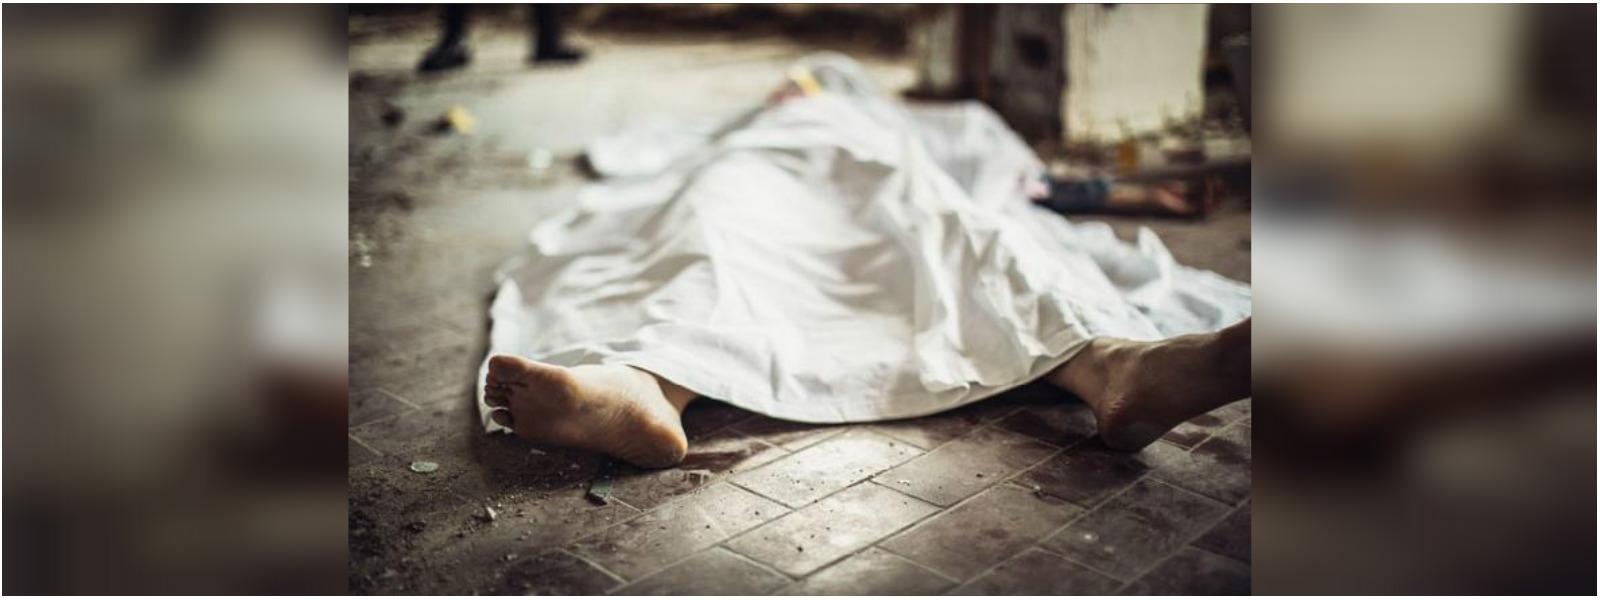 Dead body found in Anuradhapura animal farm